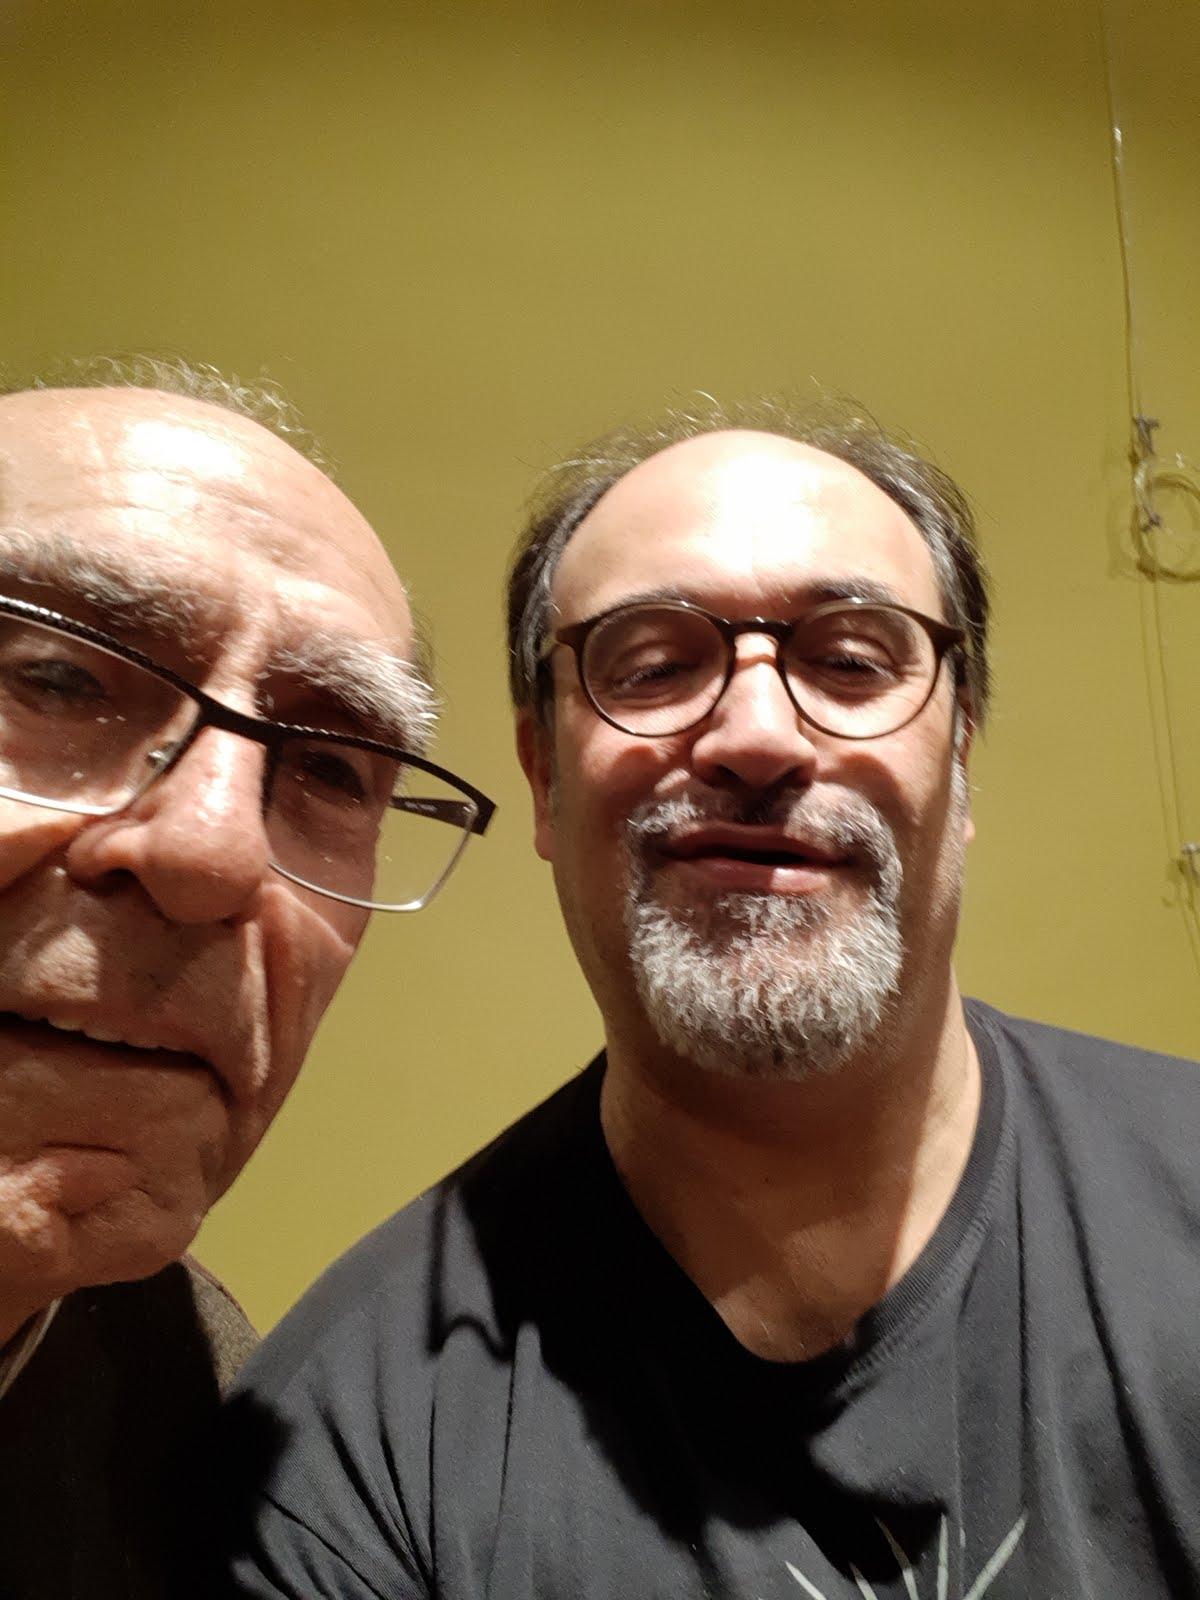 Amb el poeta Jordi Pàmias